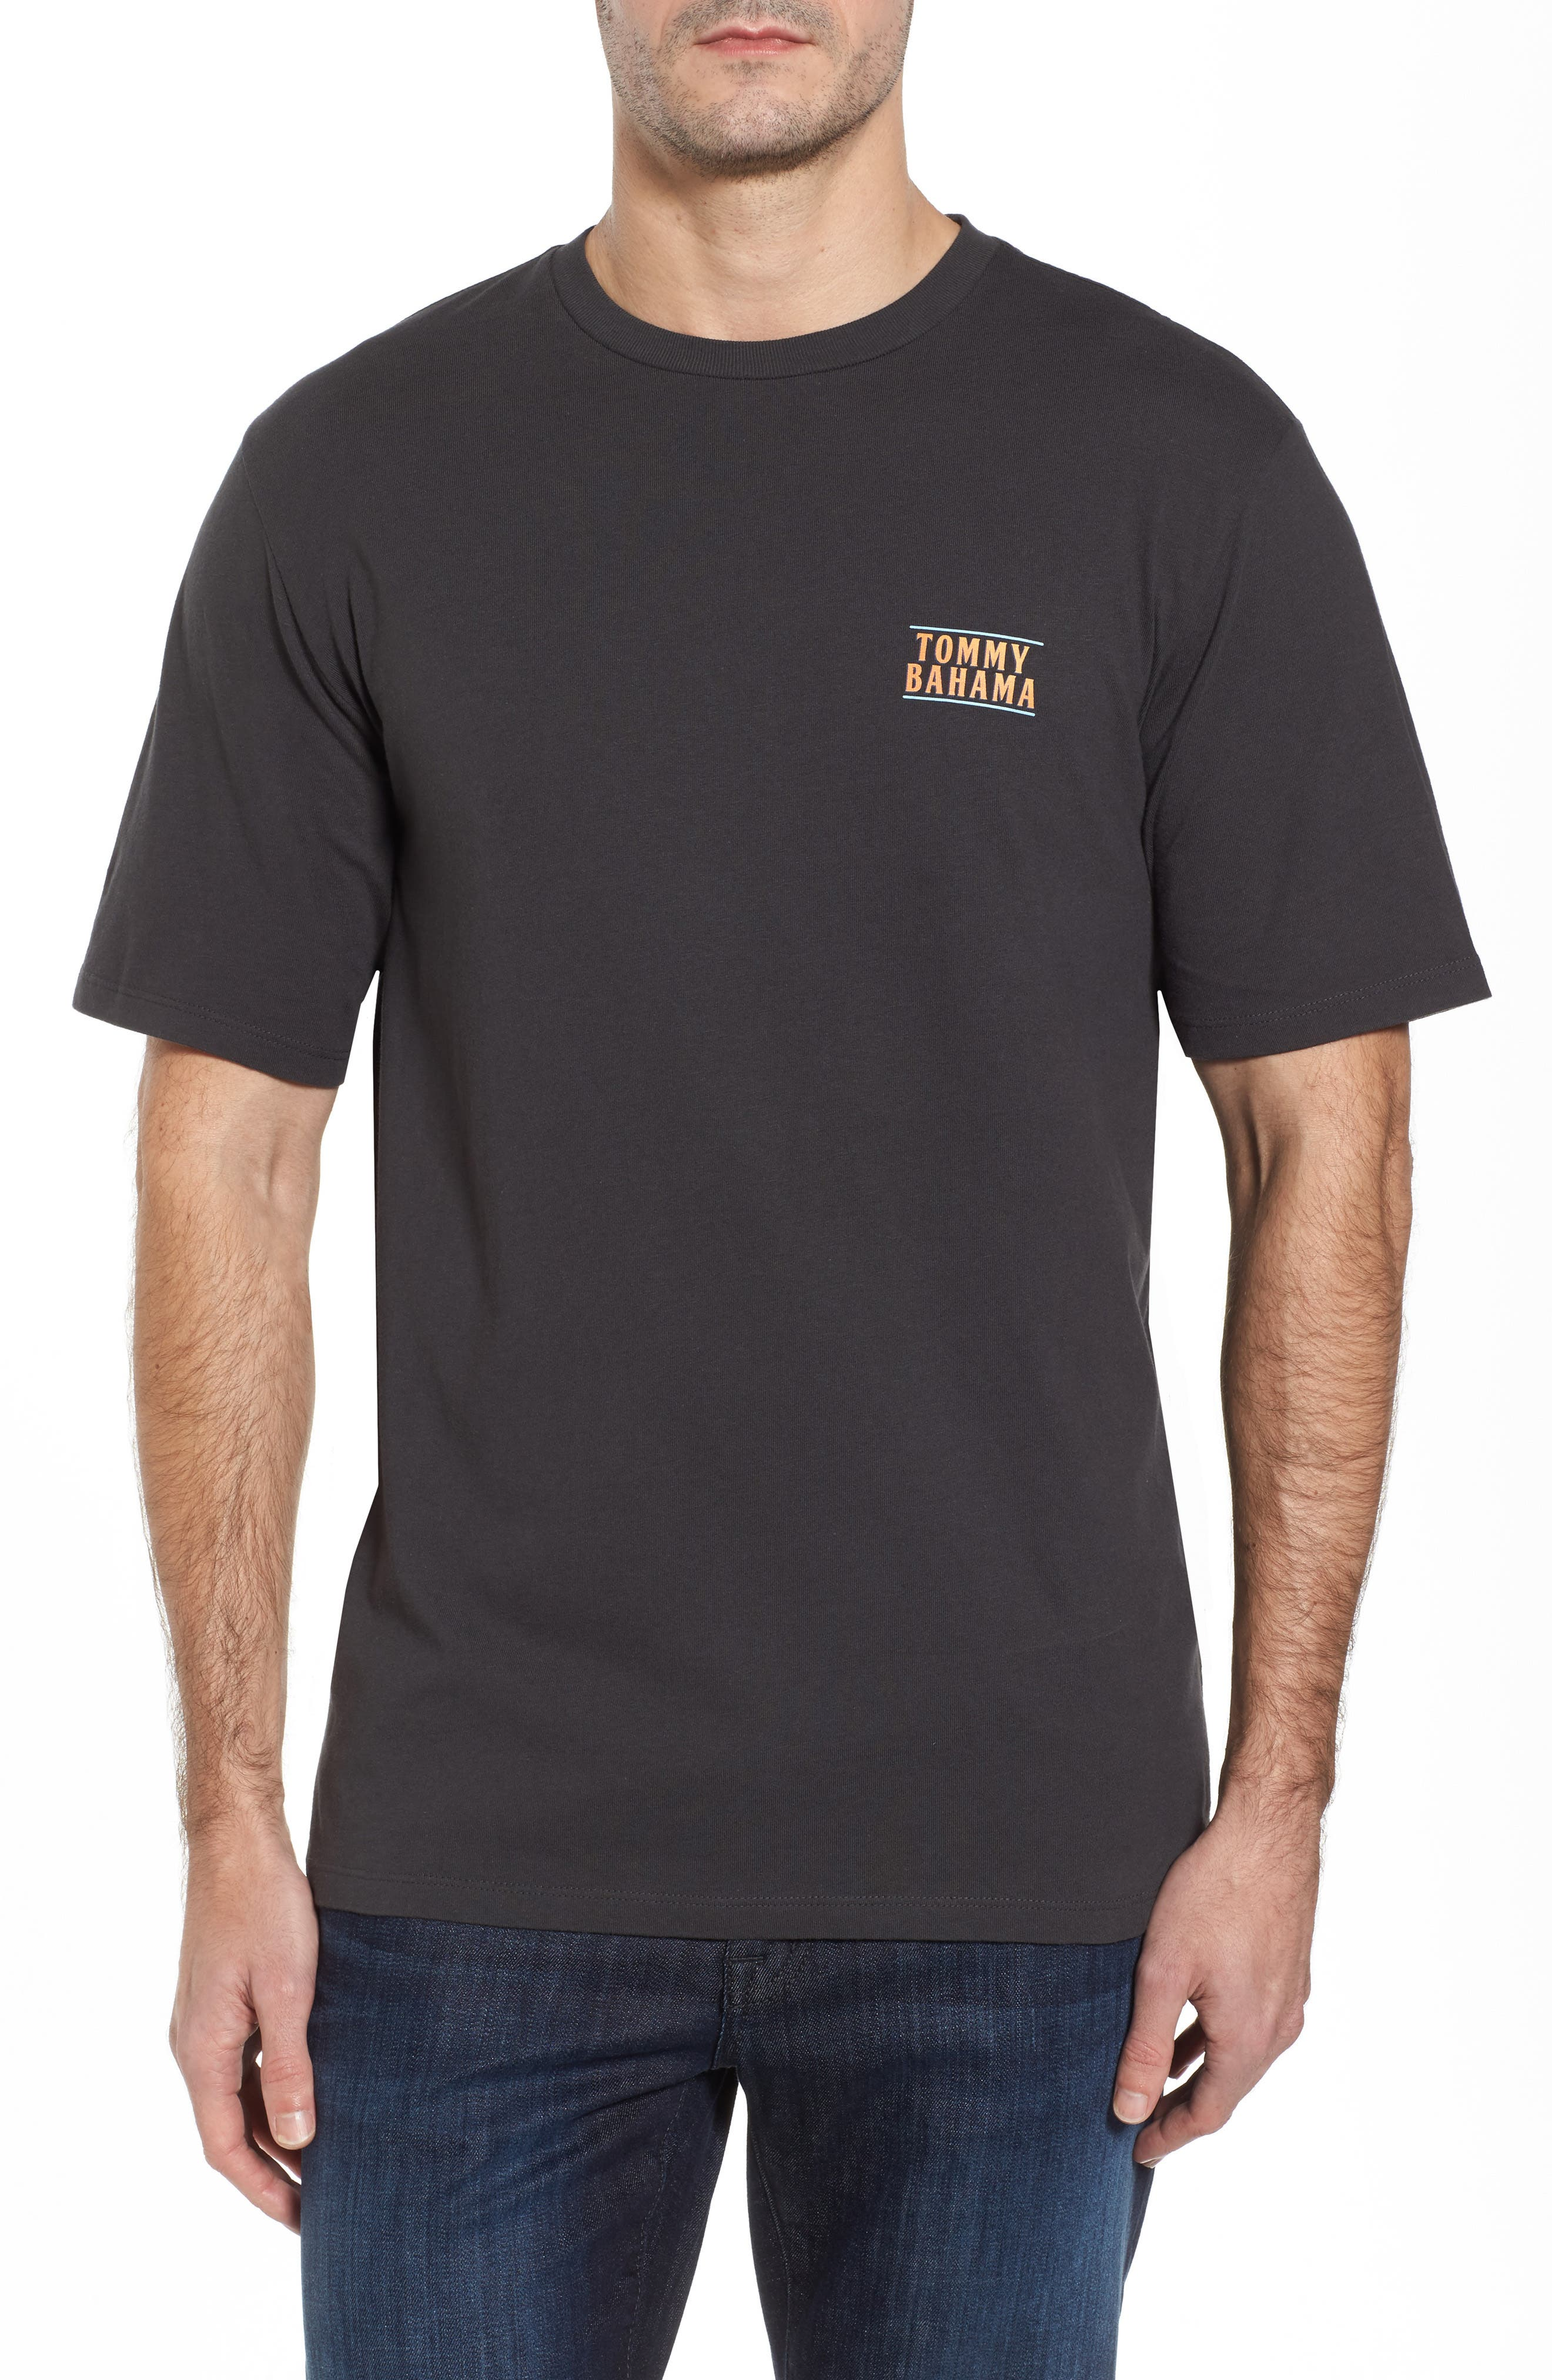 Latest Posts T-Shirt,                             Alternate thumbnail 2, color,                             Coal